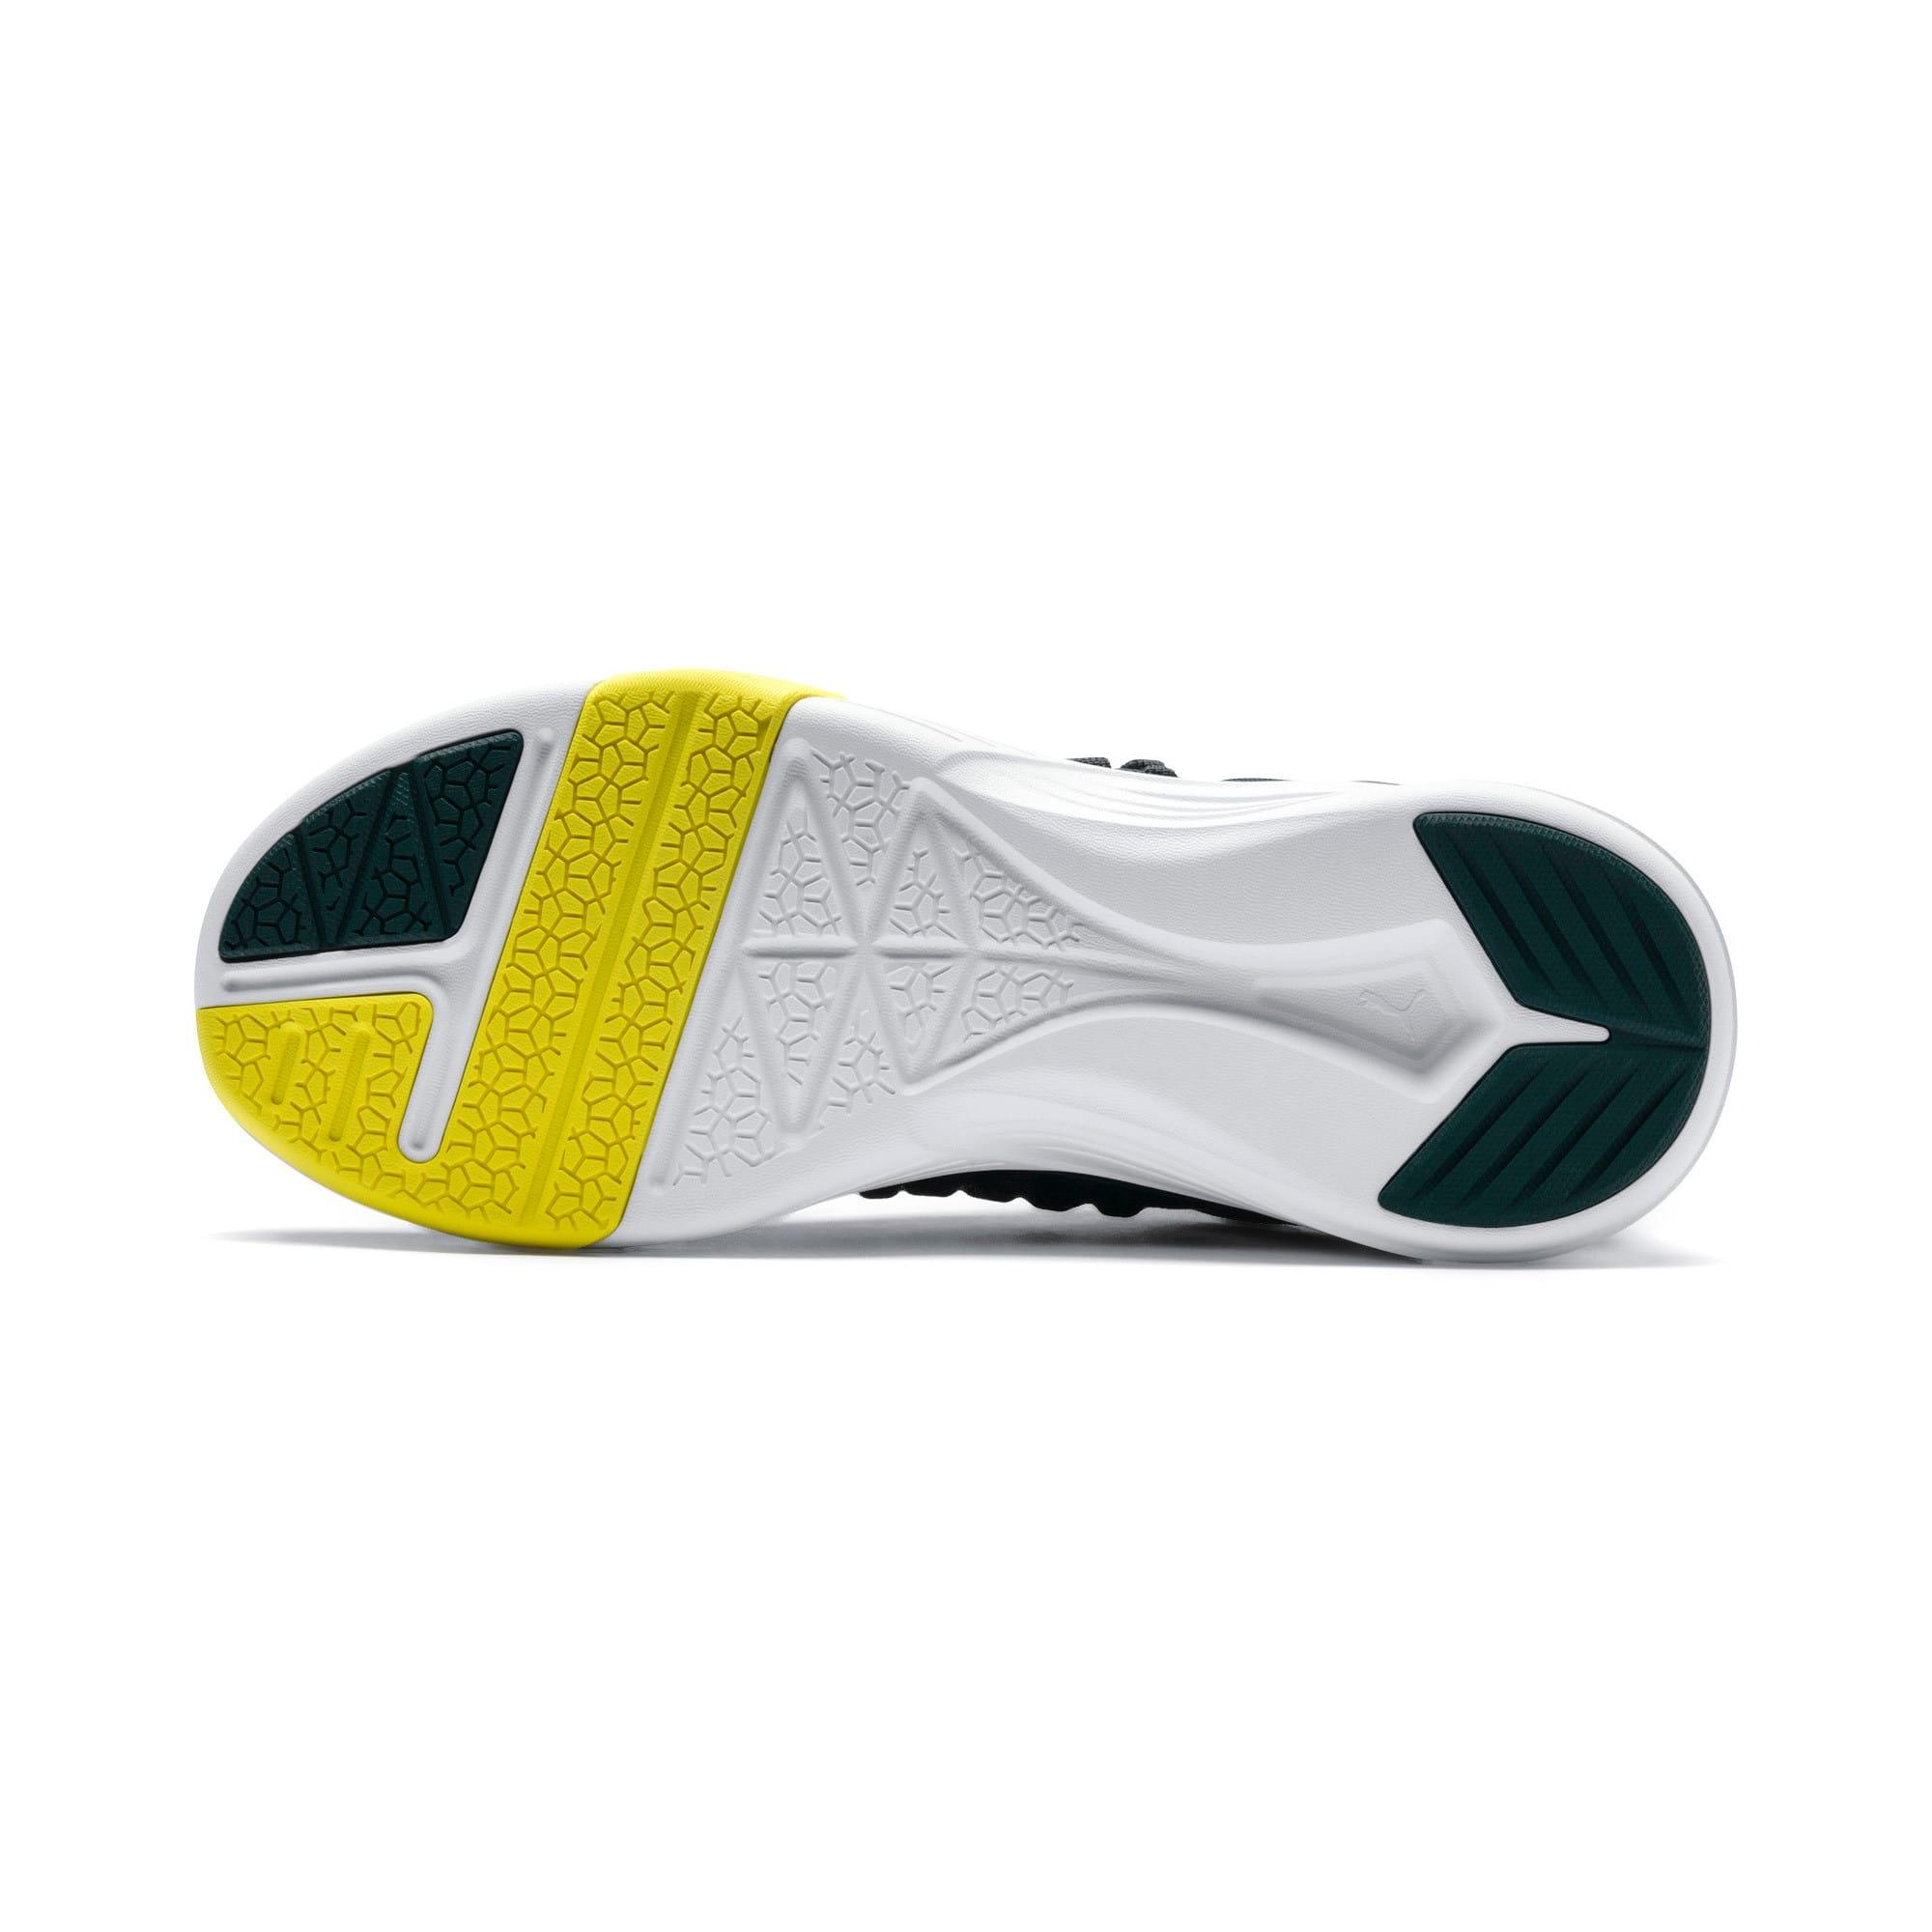 Thumbnail 5 of Mantra Men's Training Shoe, Ponderosa Pine-Puma White, medium